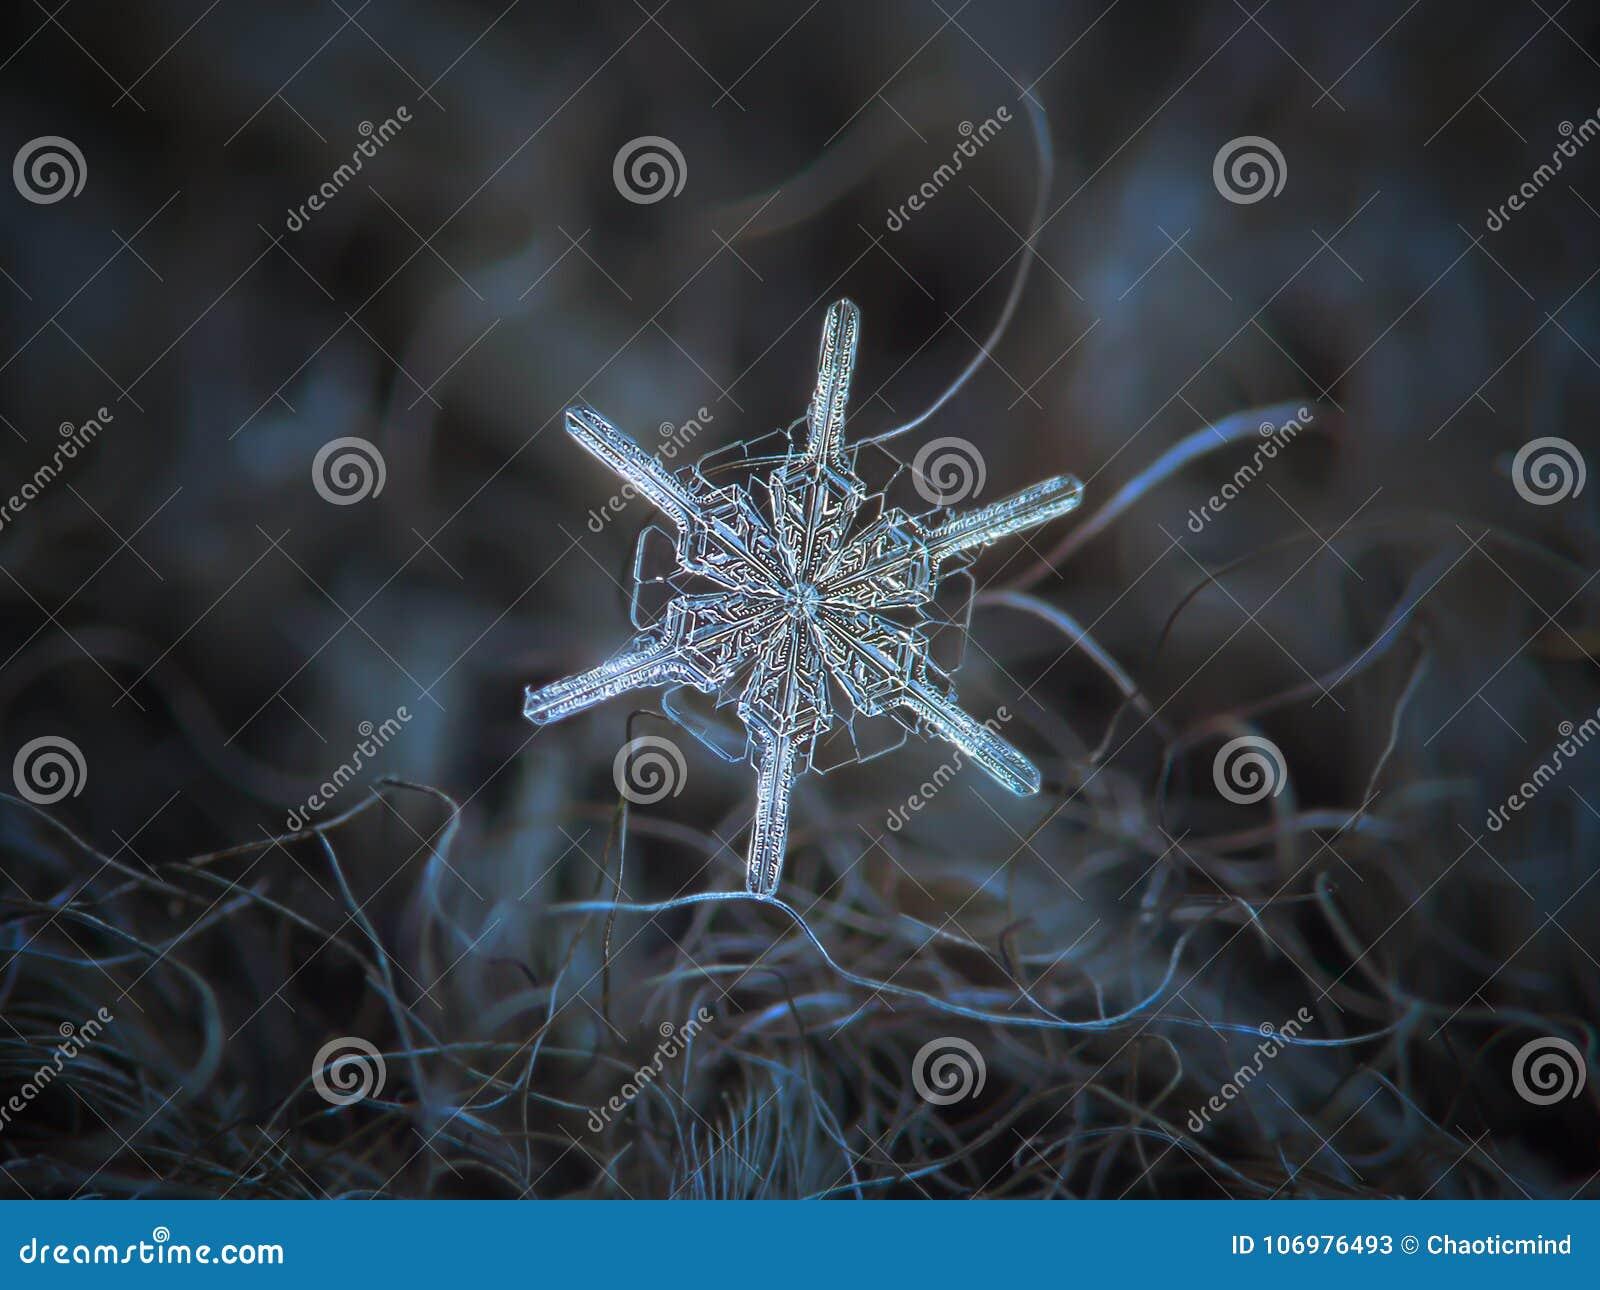 Echte sneeuwvlok die op donkere geweven achtergrond gloeien